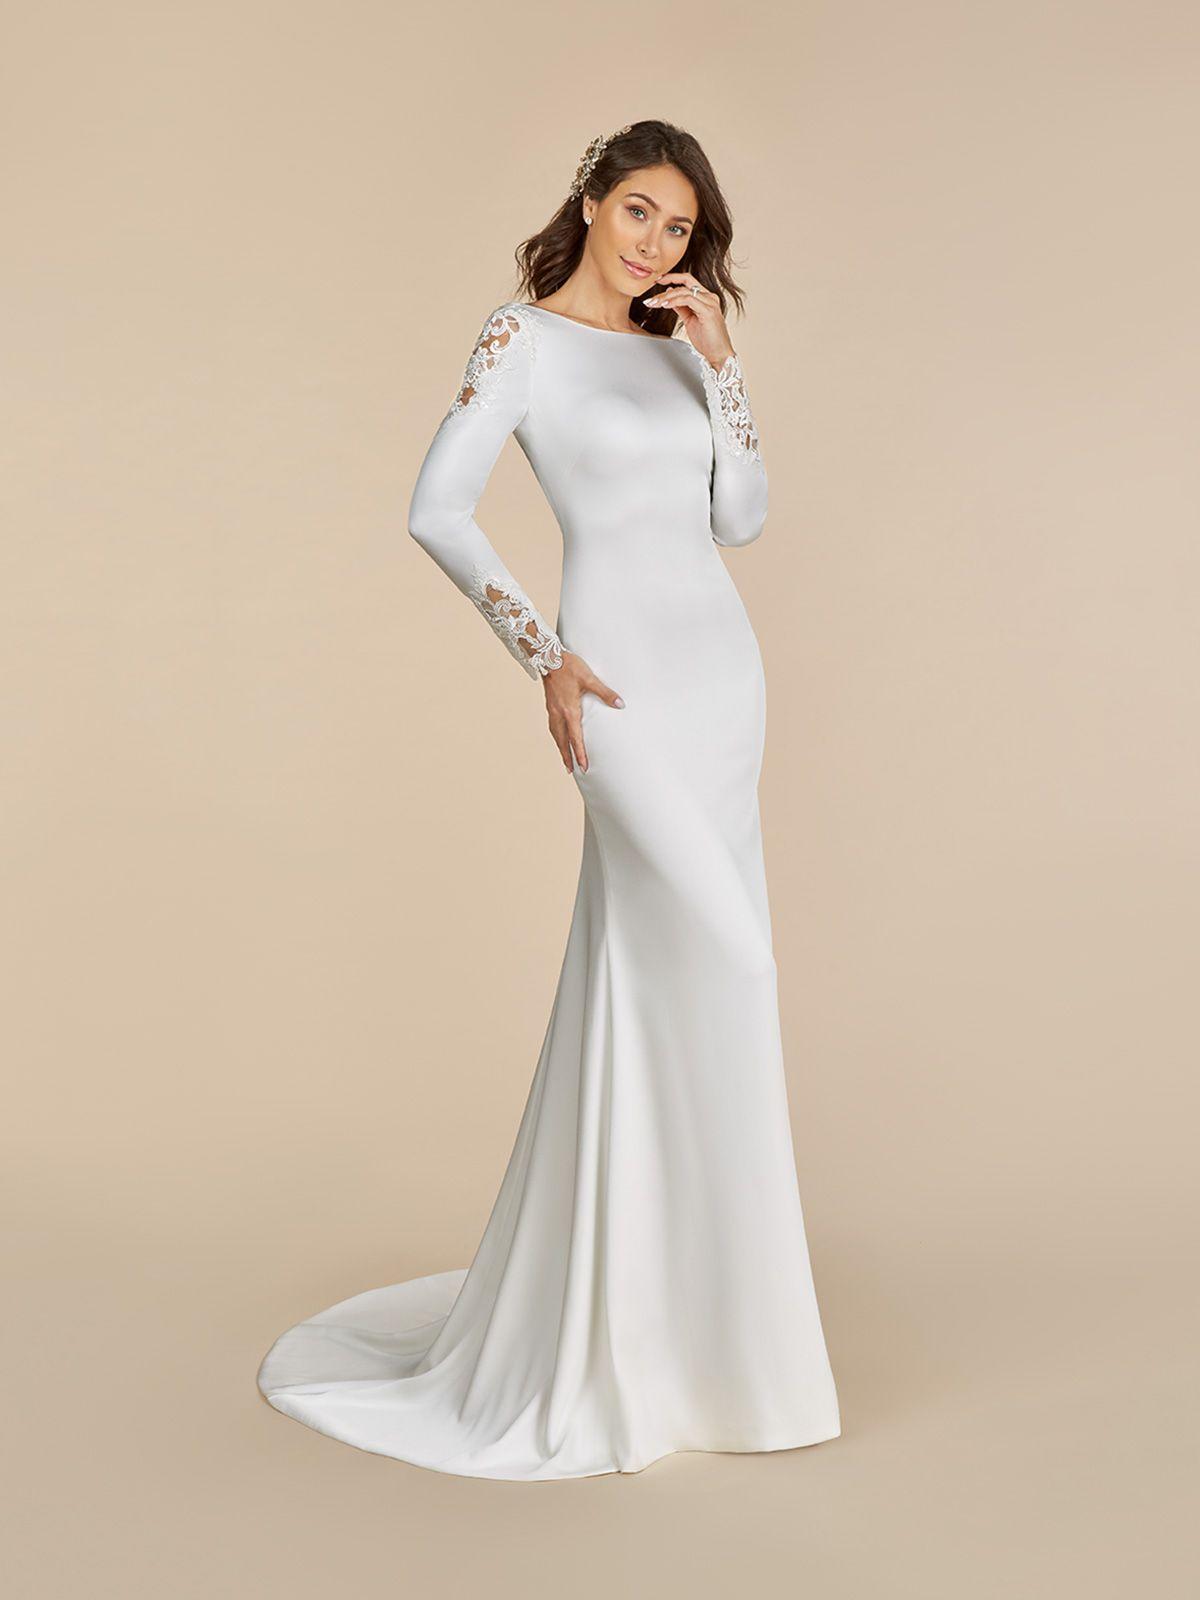 16++ Wedding dress frame ebay ideas